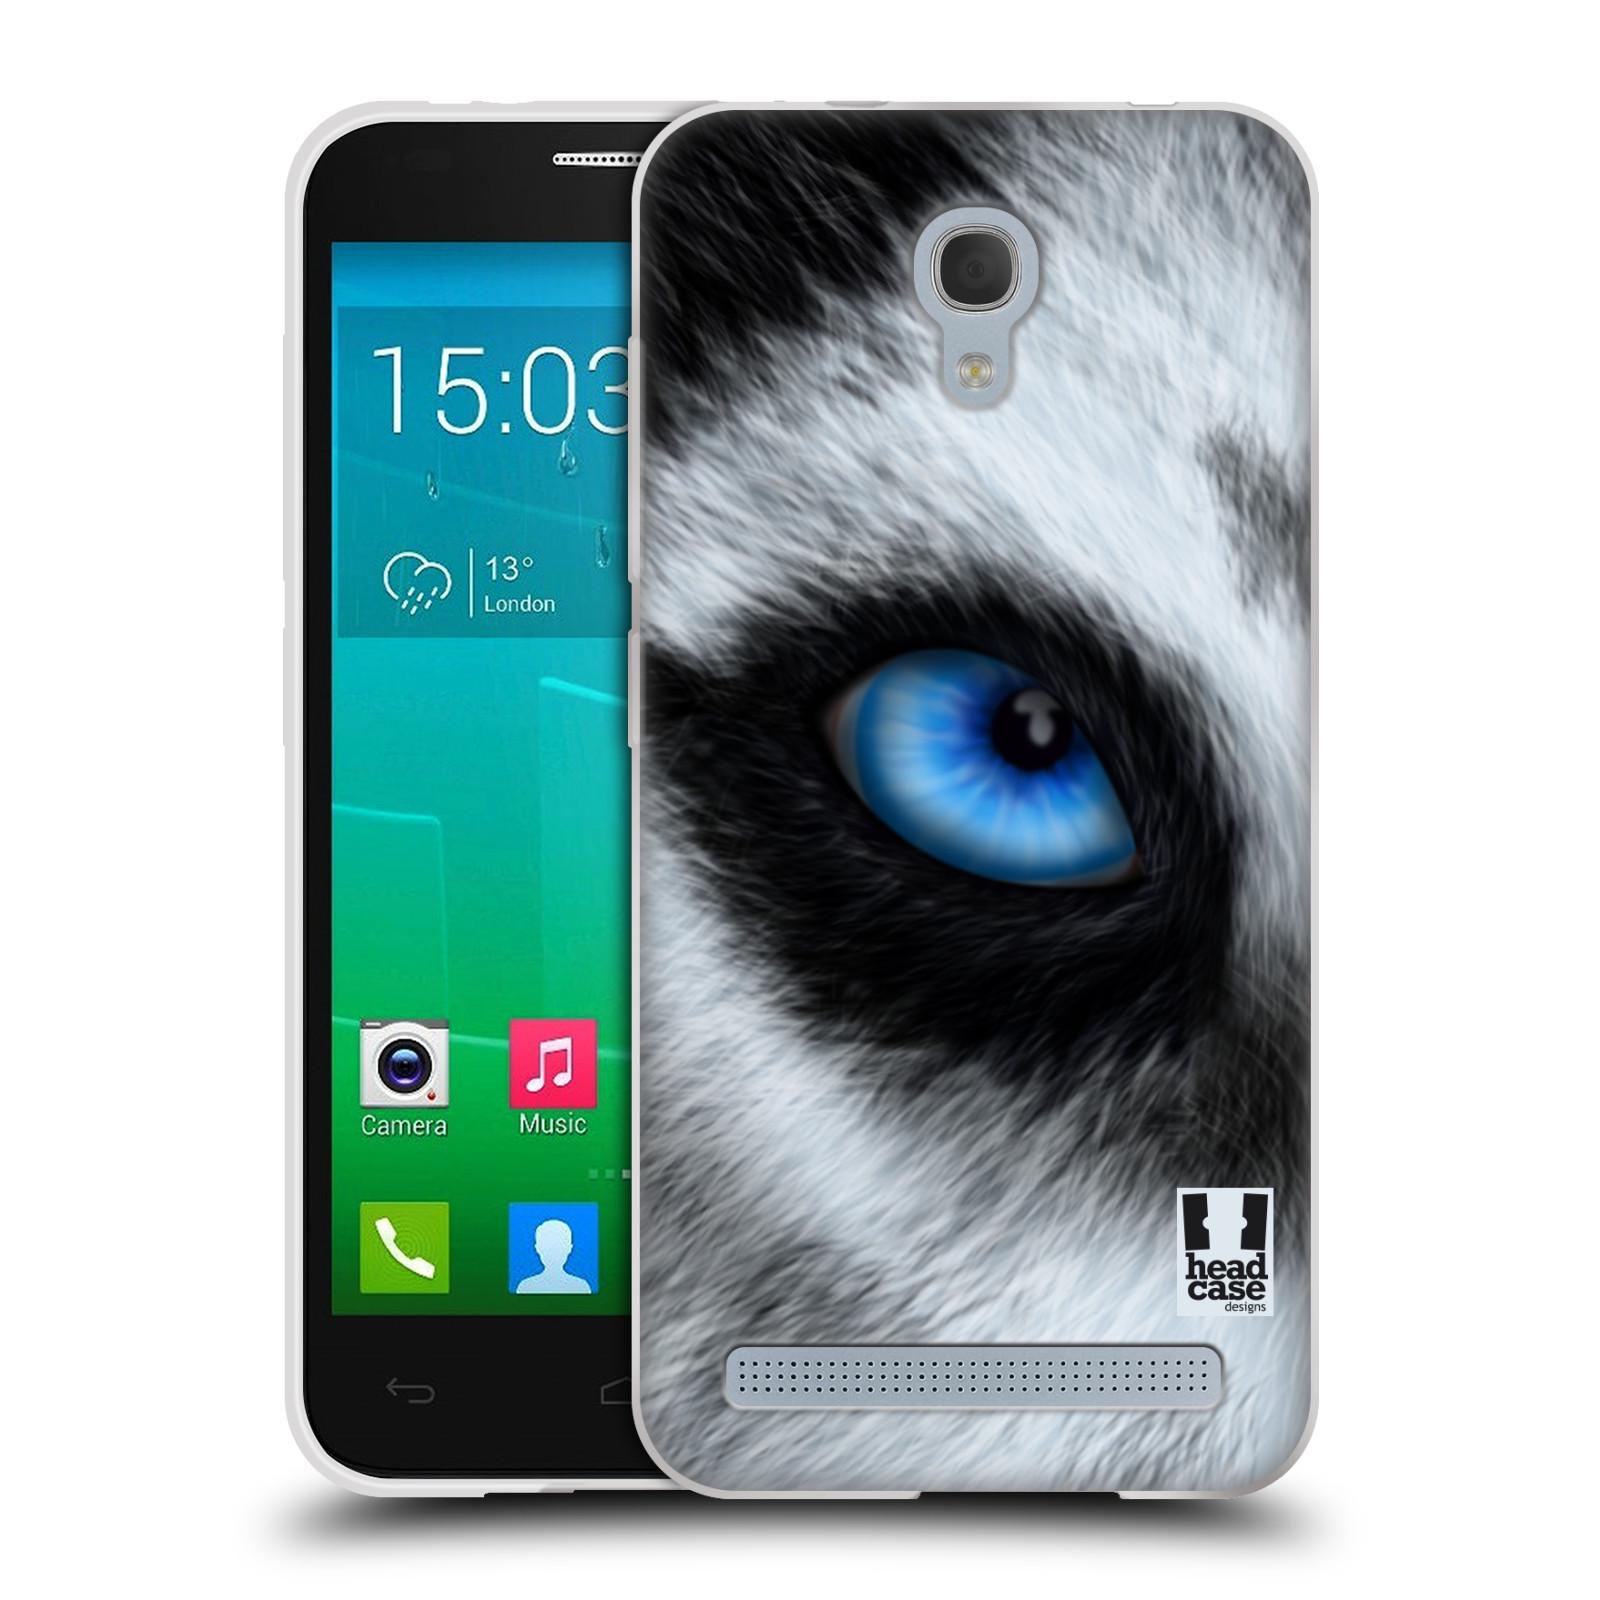 HEAD CASE silikonový obal na mobil Alcatel Idol 2 MINI S 6036Y vzor pohled zvířete oko pes husky